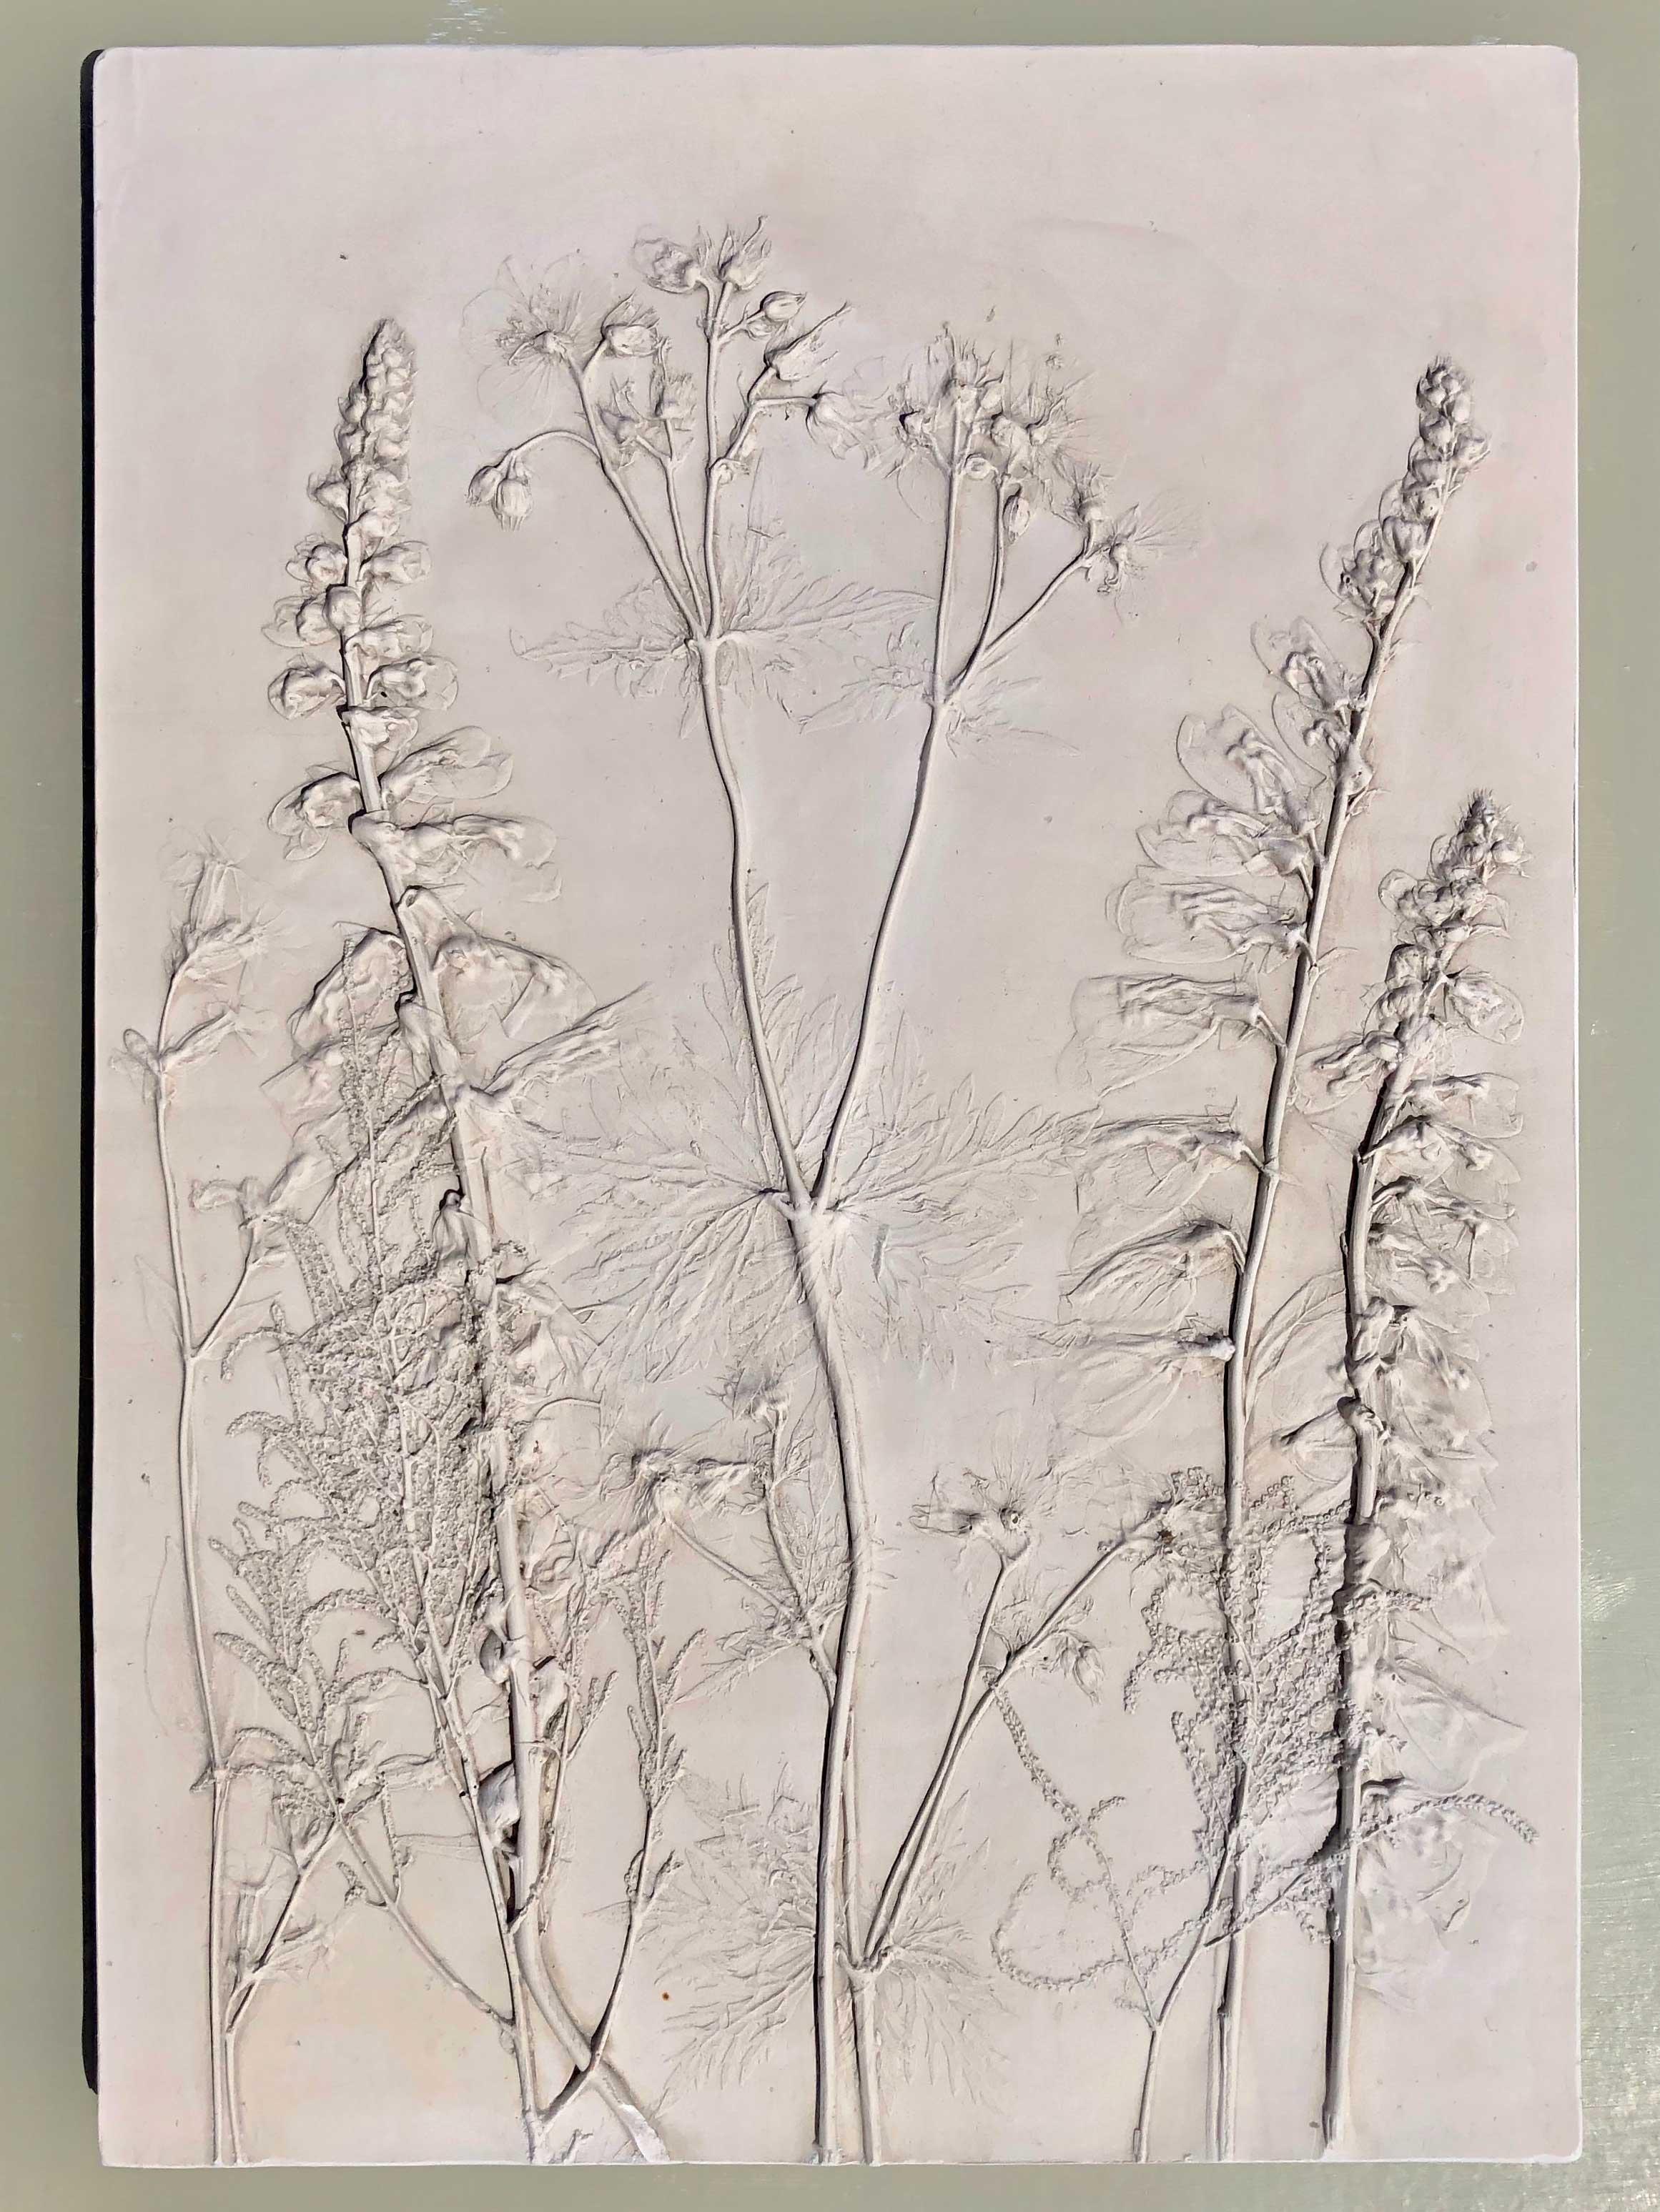 Katy Eccles Foxglove and Geranium